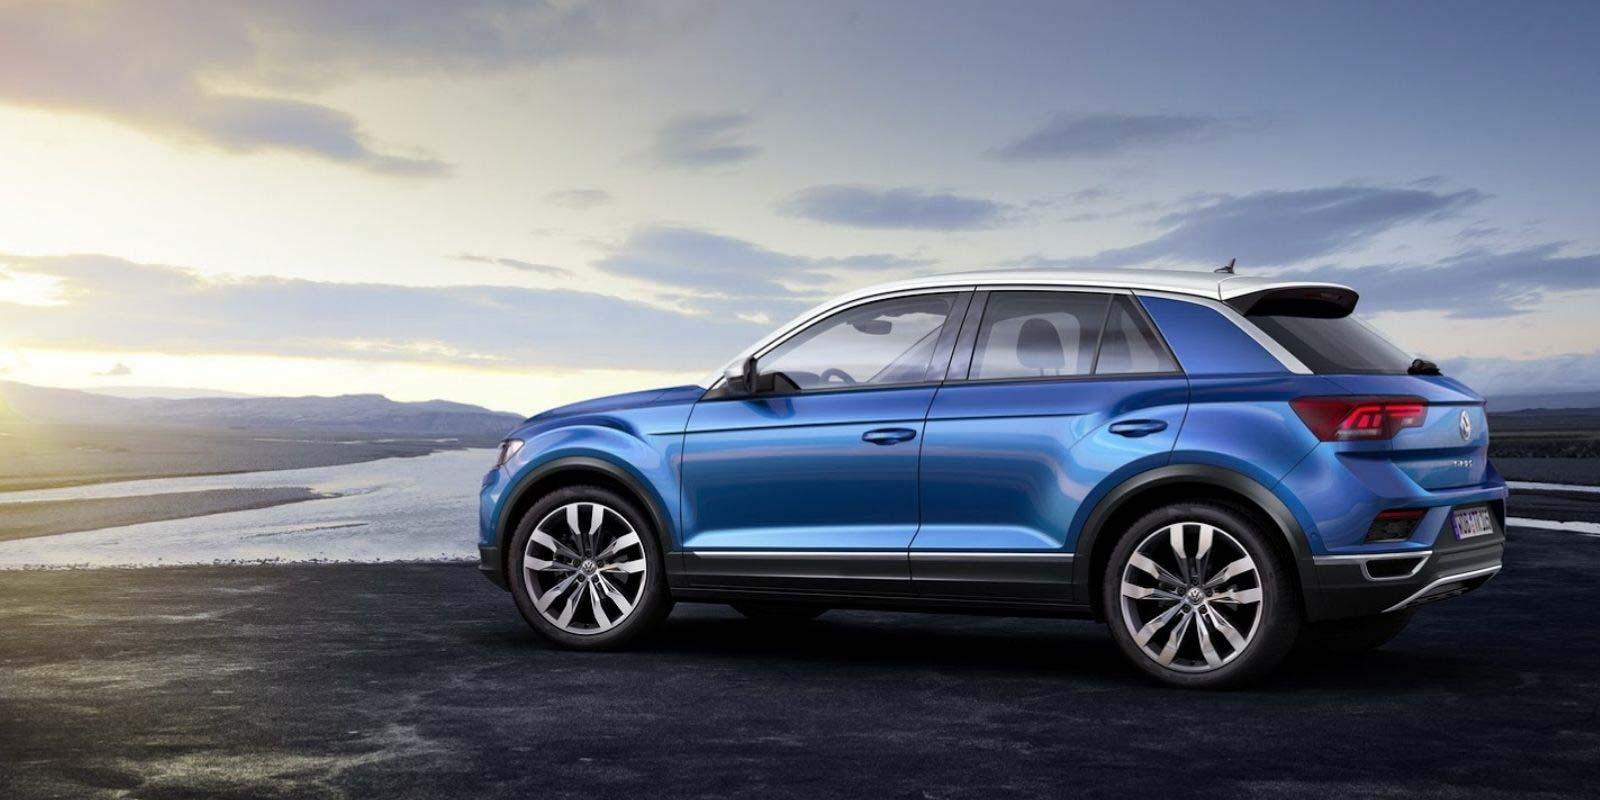 2021 Volkswagen T-Roc Will Now Cost Rs 21.35 Lakh In India - GaadiWaadi.com